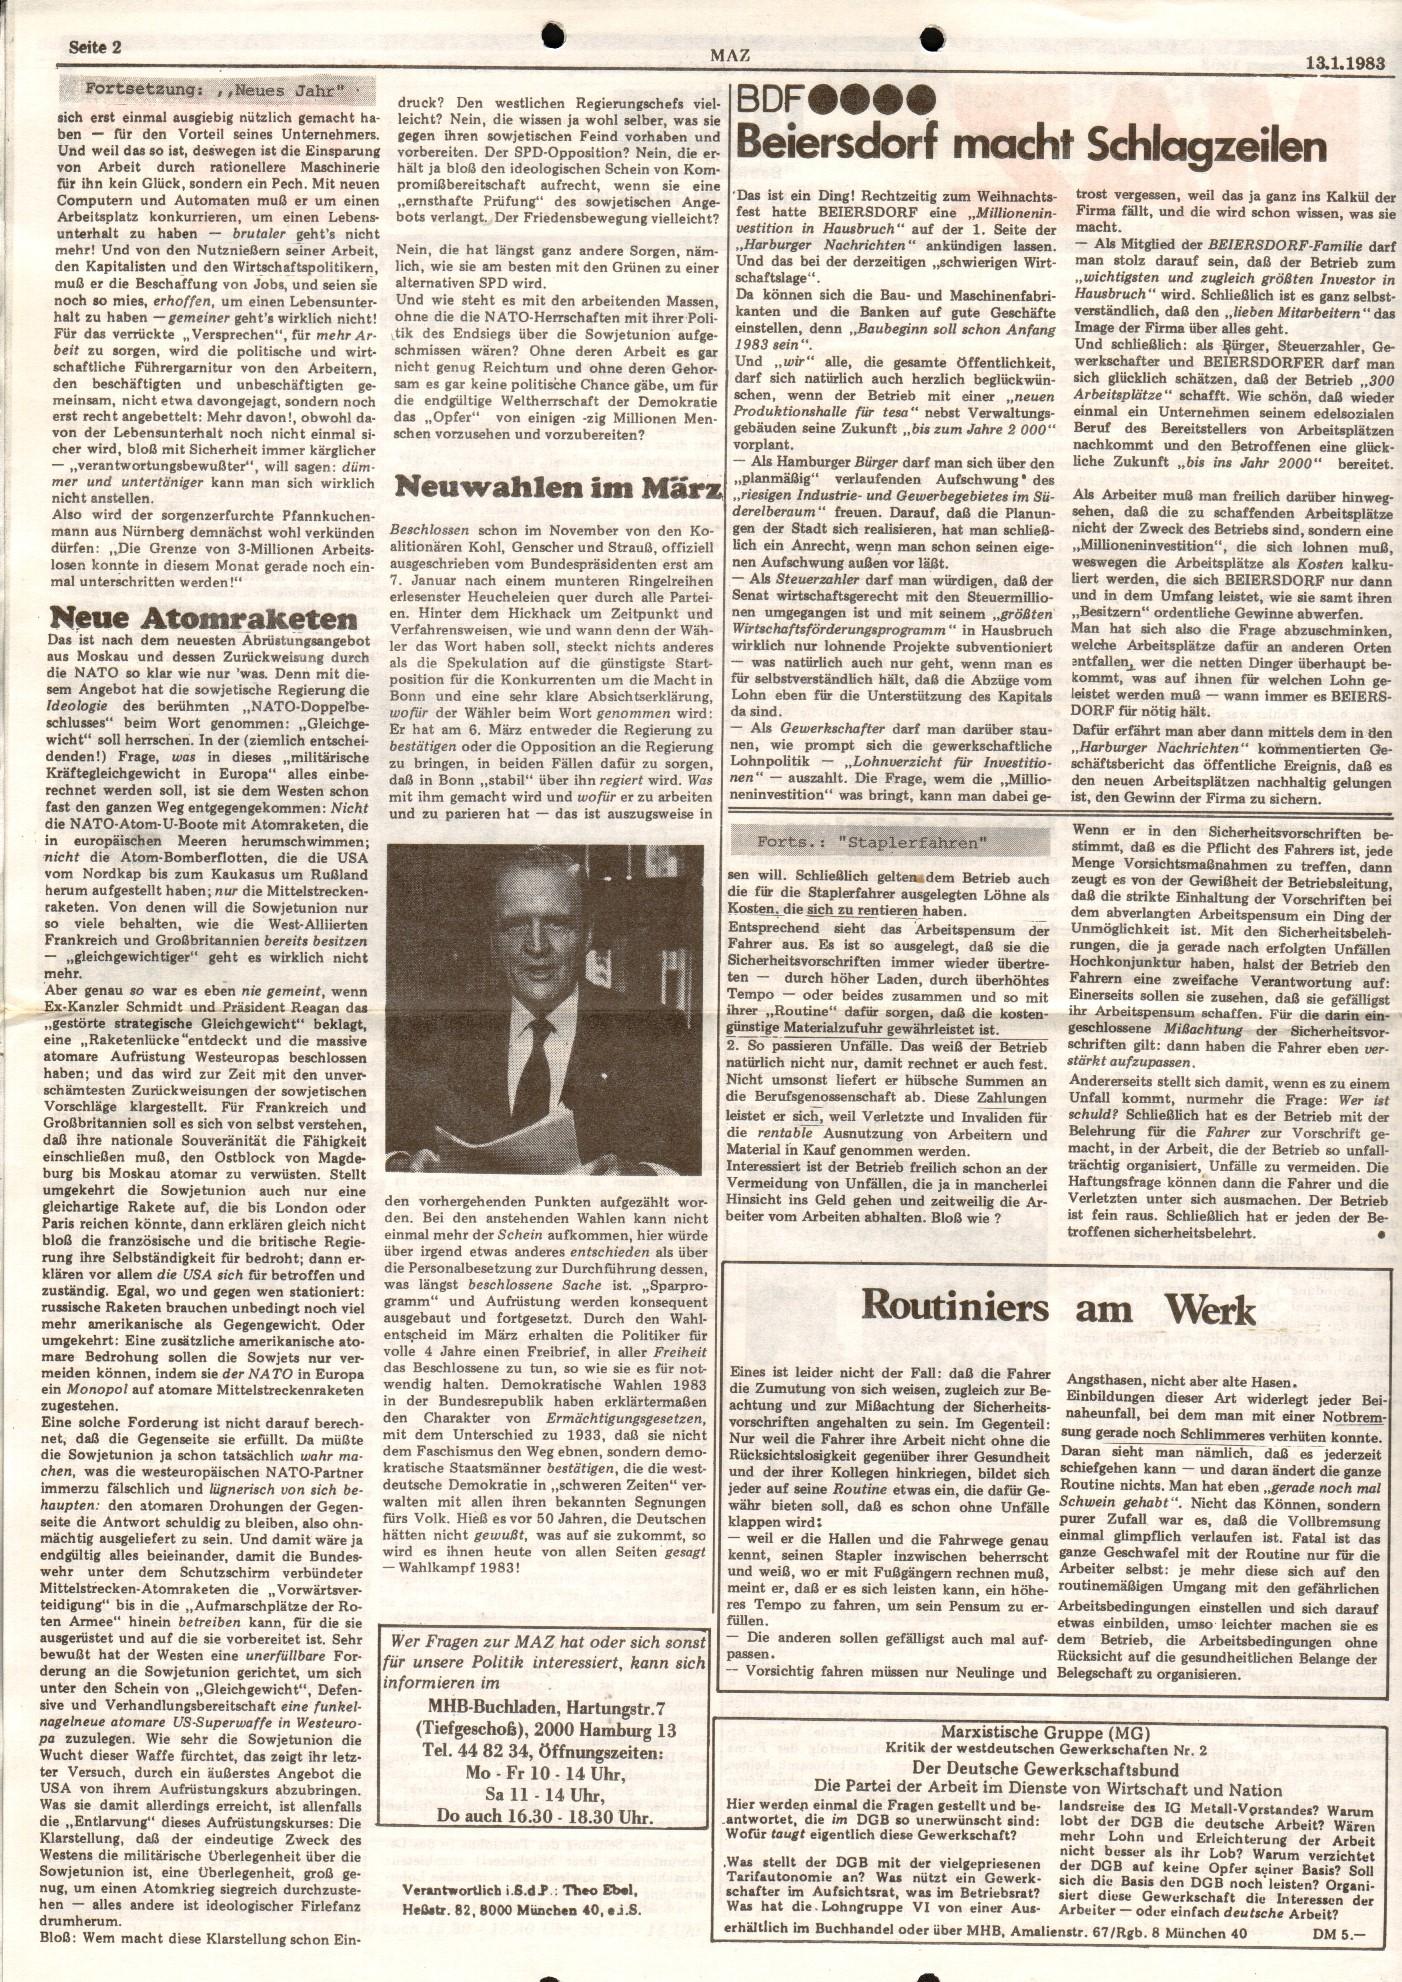 Hamburg_MG_MAZ_Chemie_19830113_02